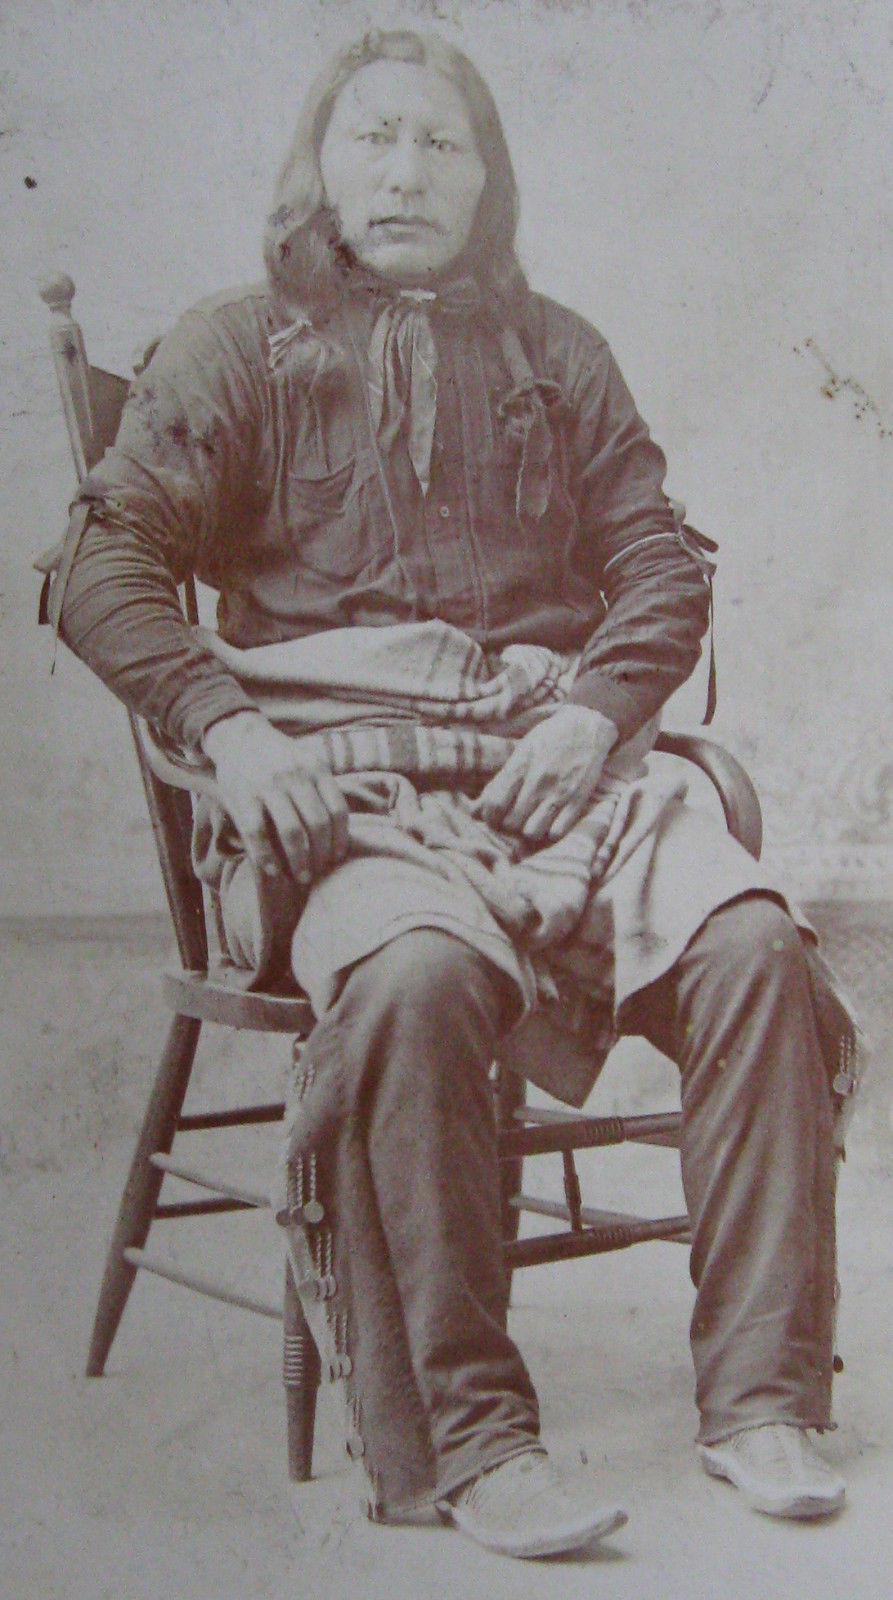 http://www.american-tribes.com/messageboards/dietmar/unidentifiedHunkpapaman2.jpg